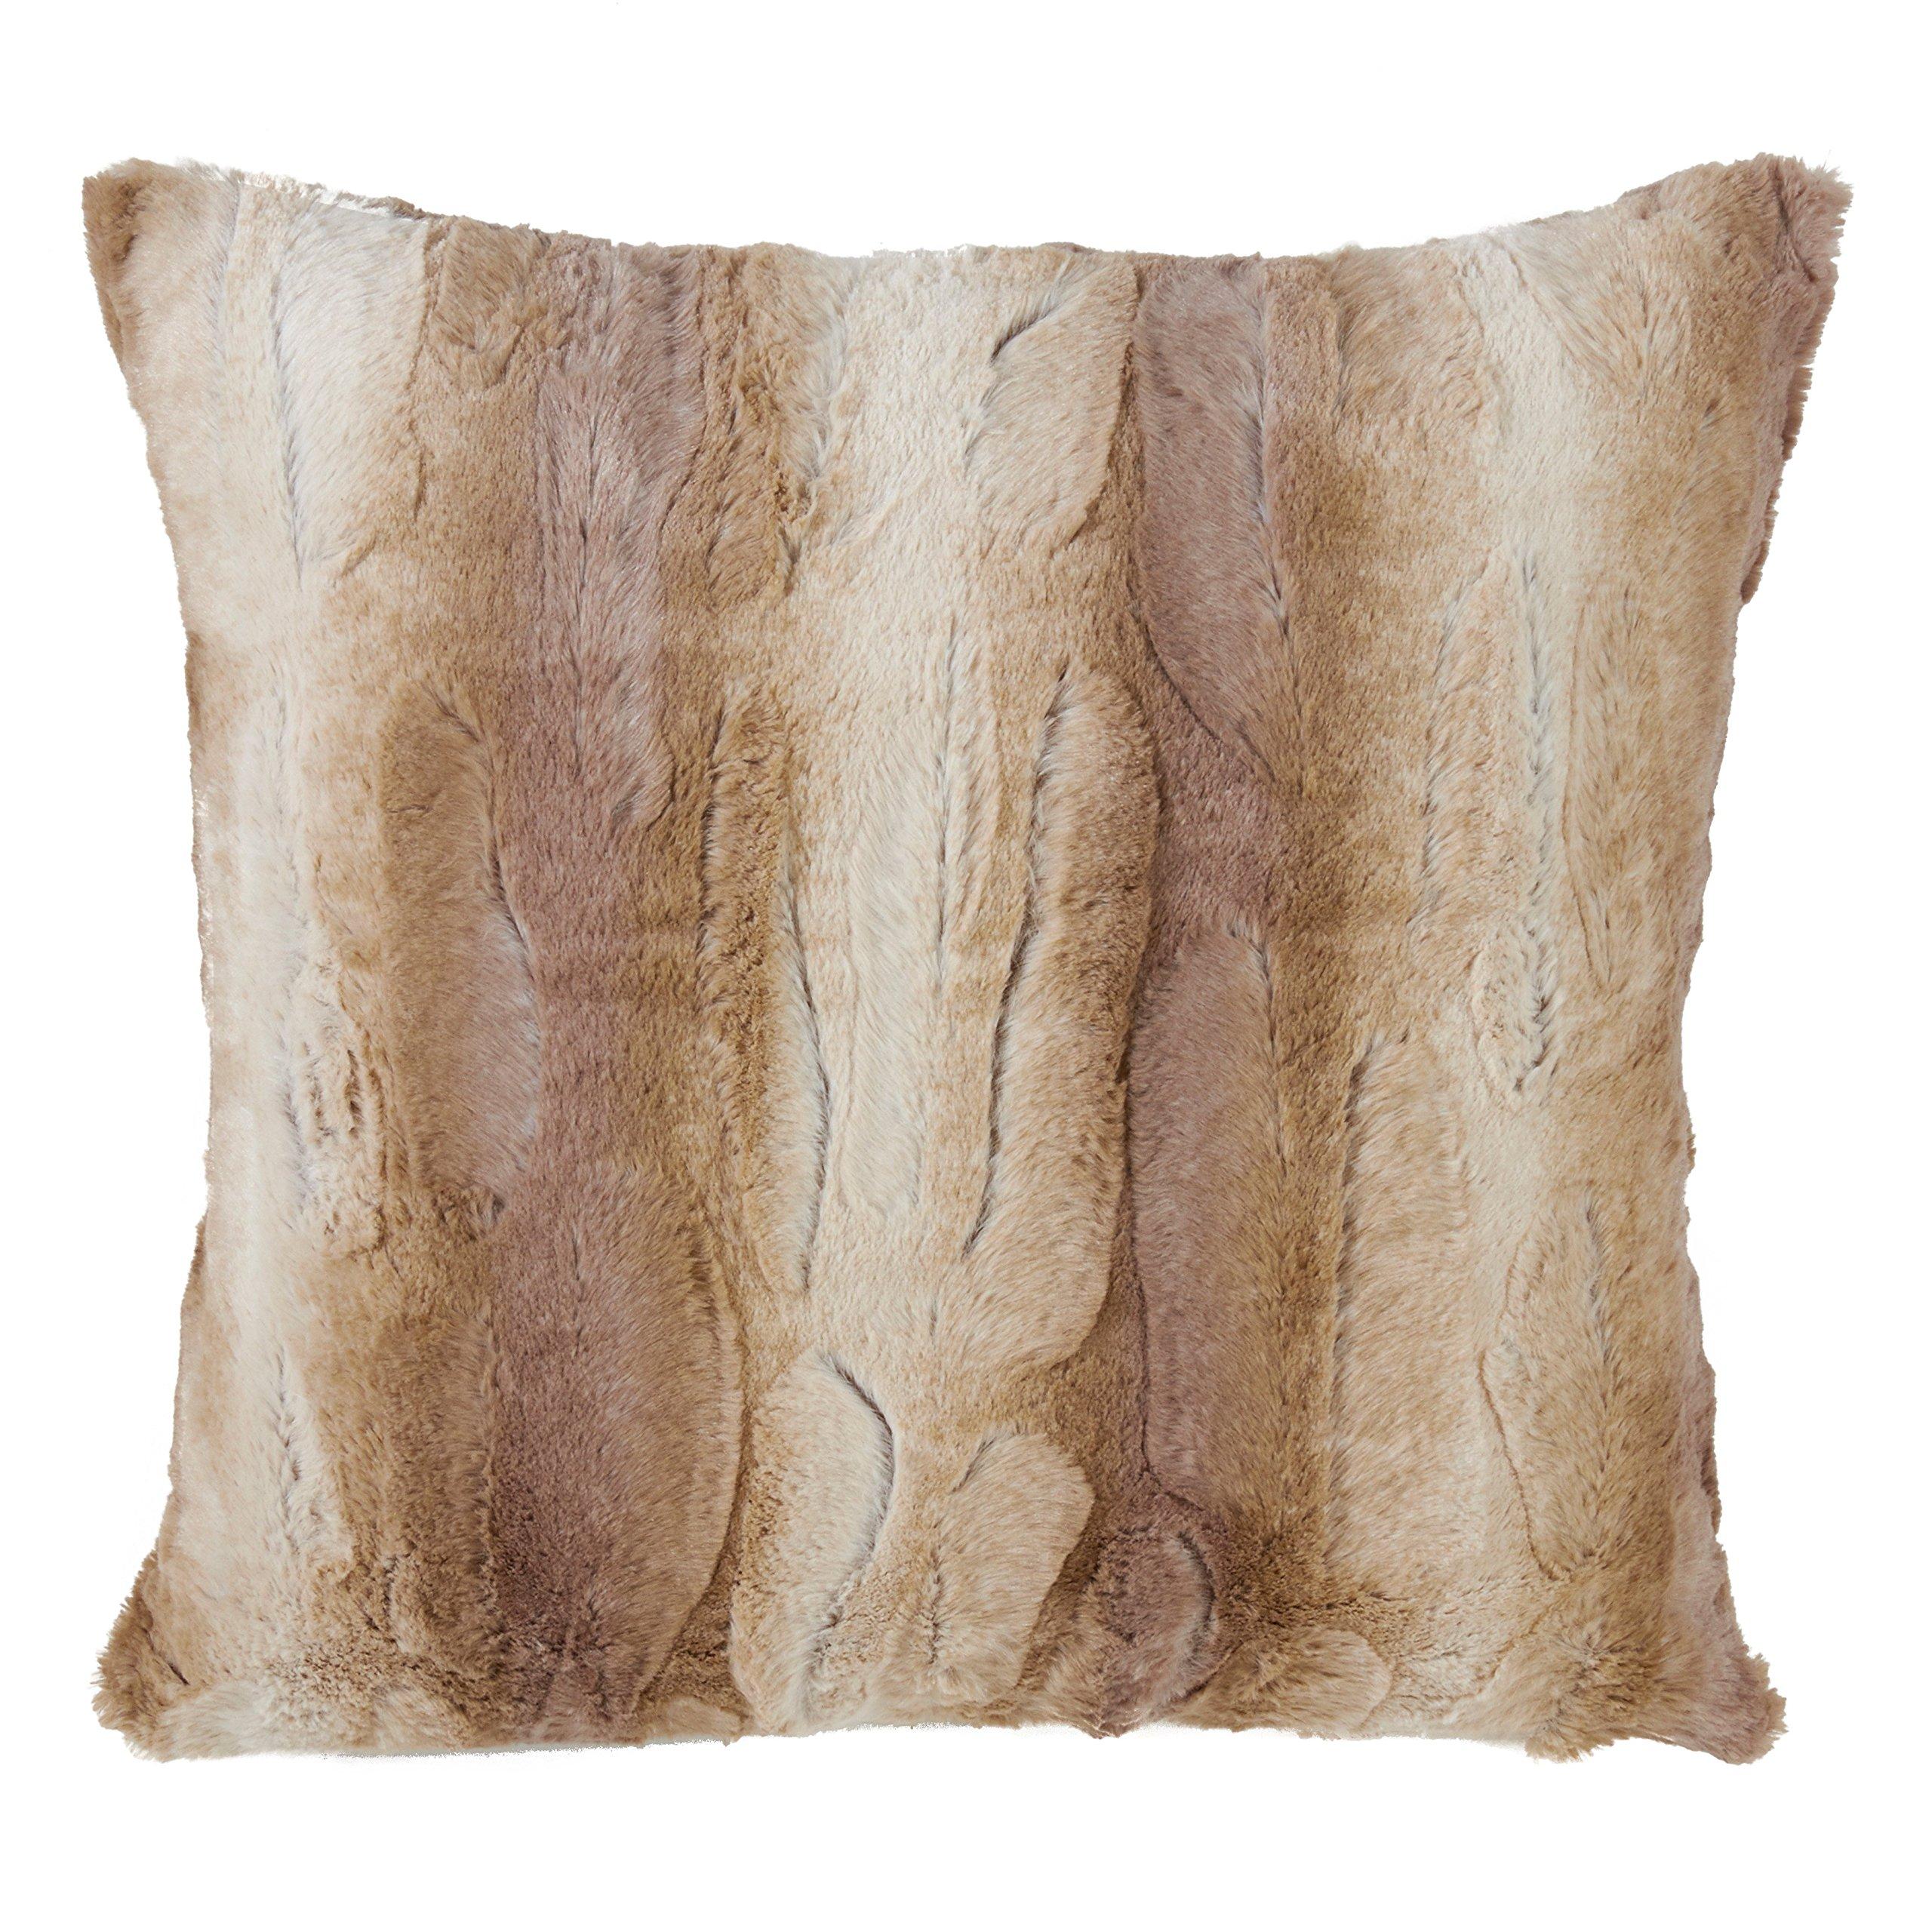 SARO LIFESTYLE Wilma Collection Timeless Animal Print Faux Fur Poly Filled Throw Pillow, 20'', Natural